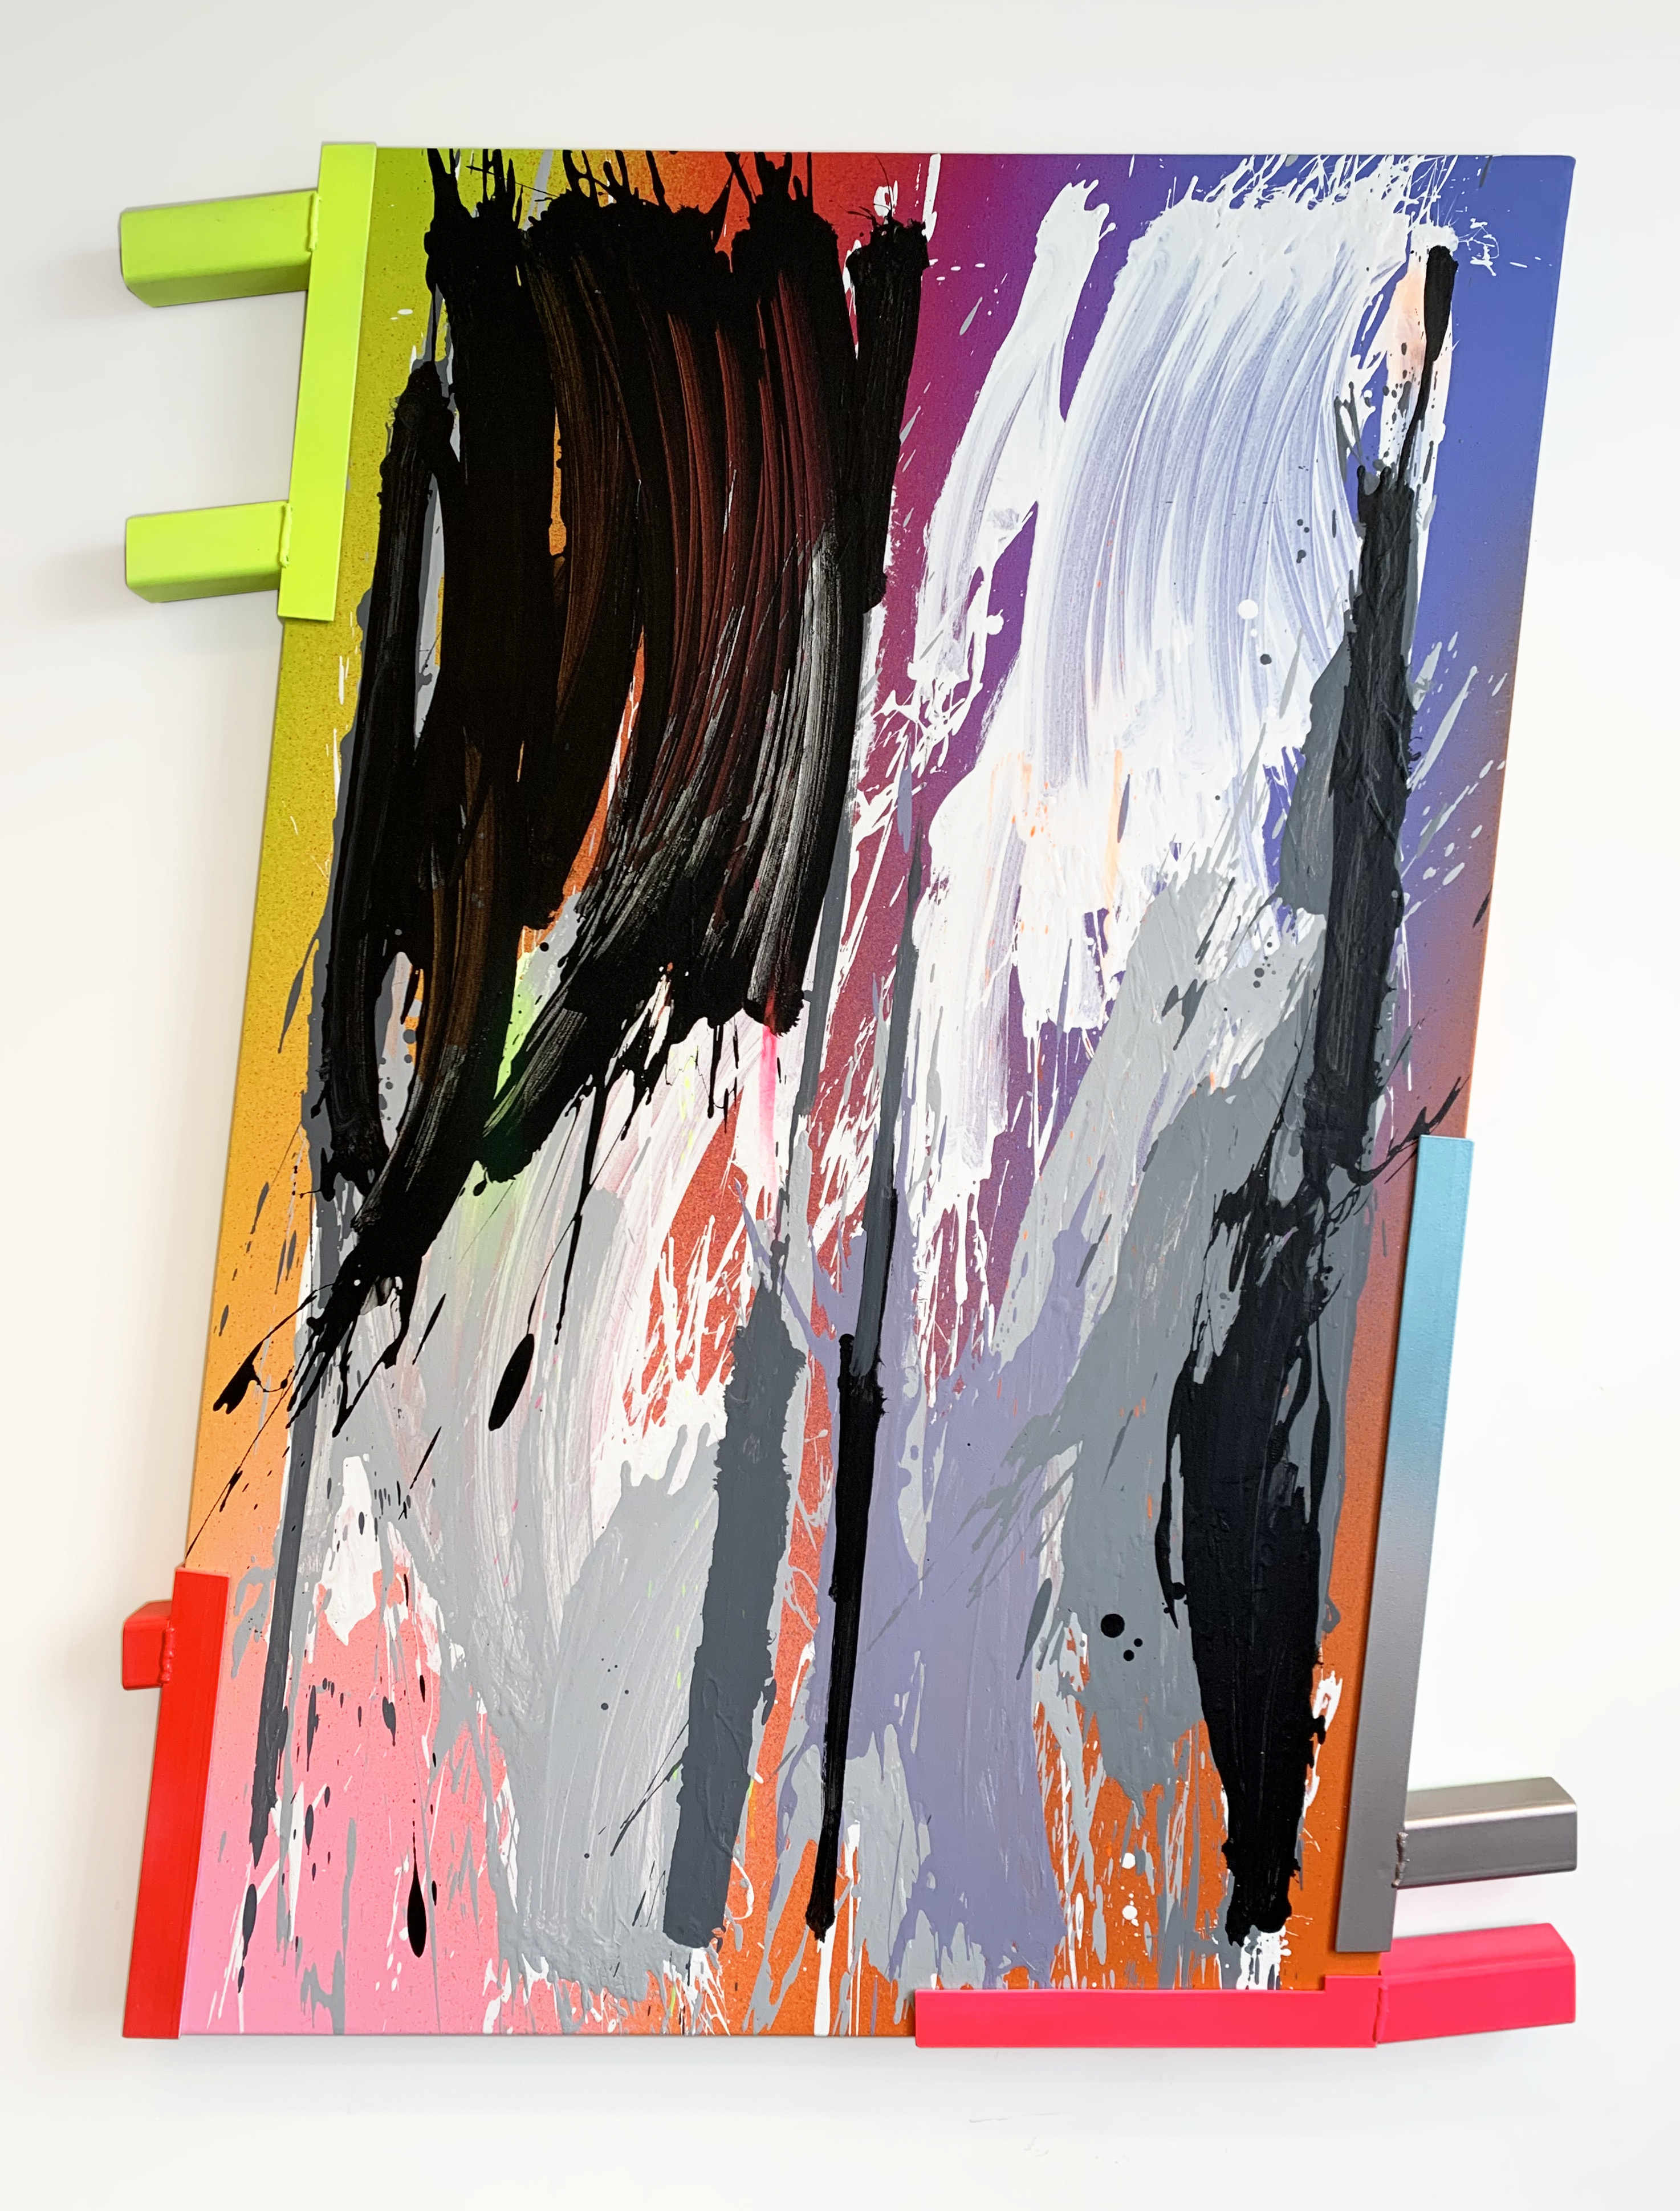 NemesM_The-Better-Self-03_2020_132x101cm_carpaint-steel-acrylic-canvas-wood-min